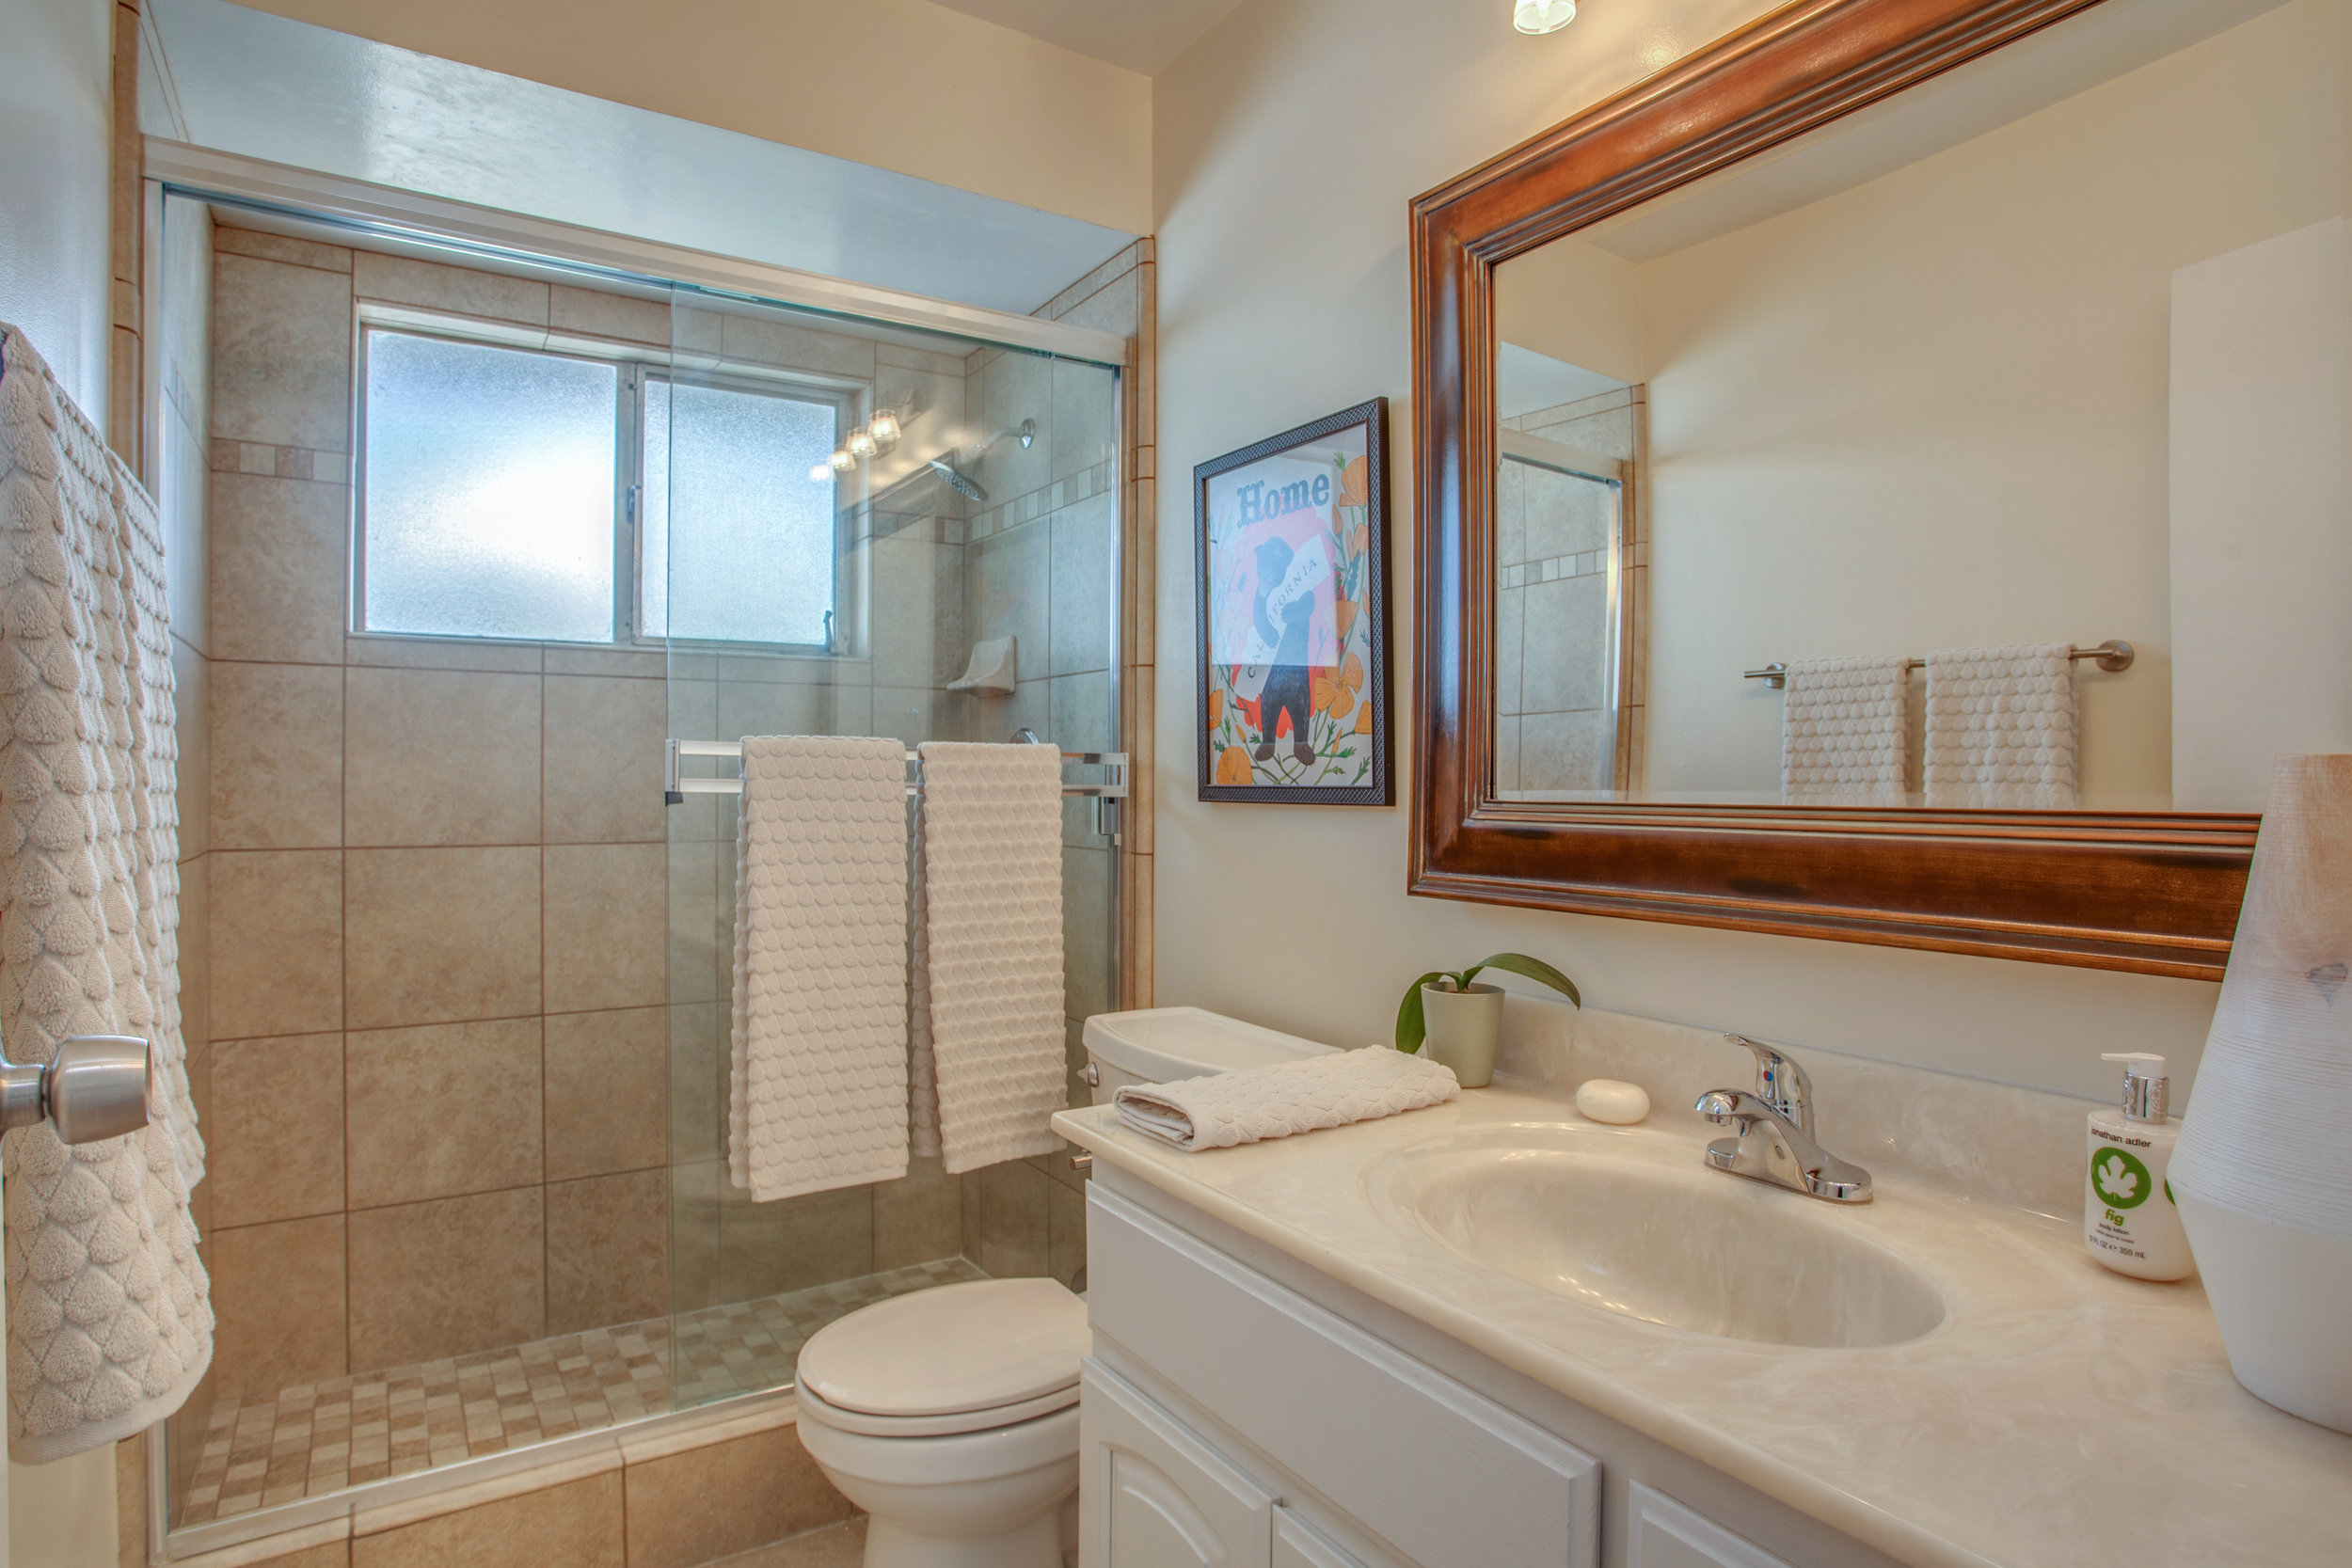 1730_silverwood_drive_MLS_HID1119713_ROOMfullbathroom.jpg